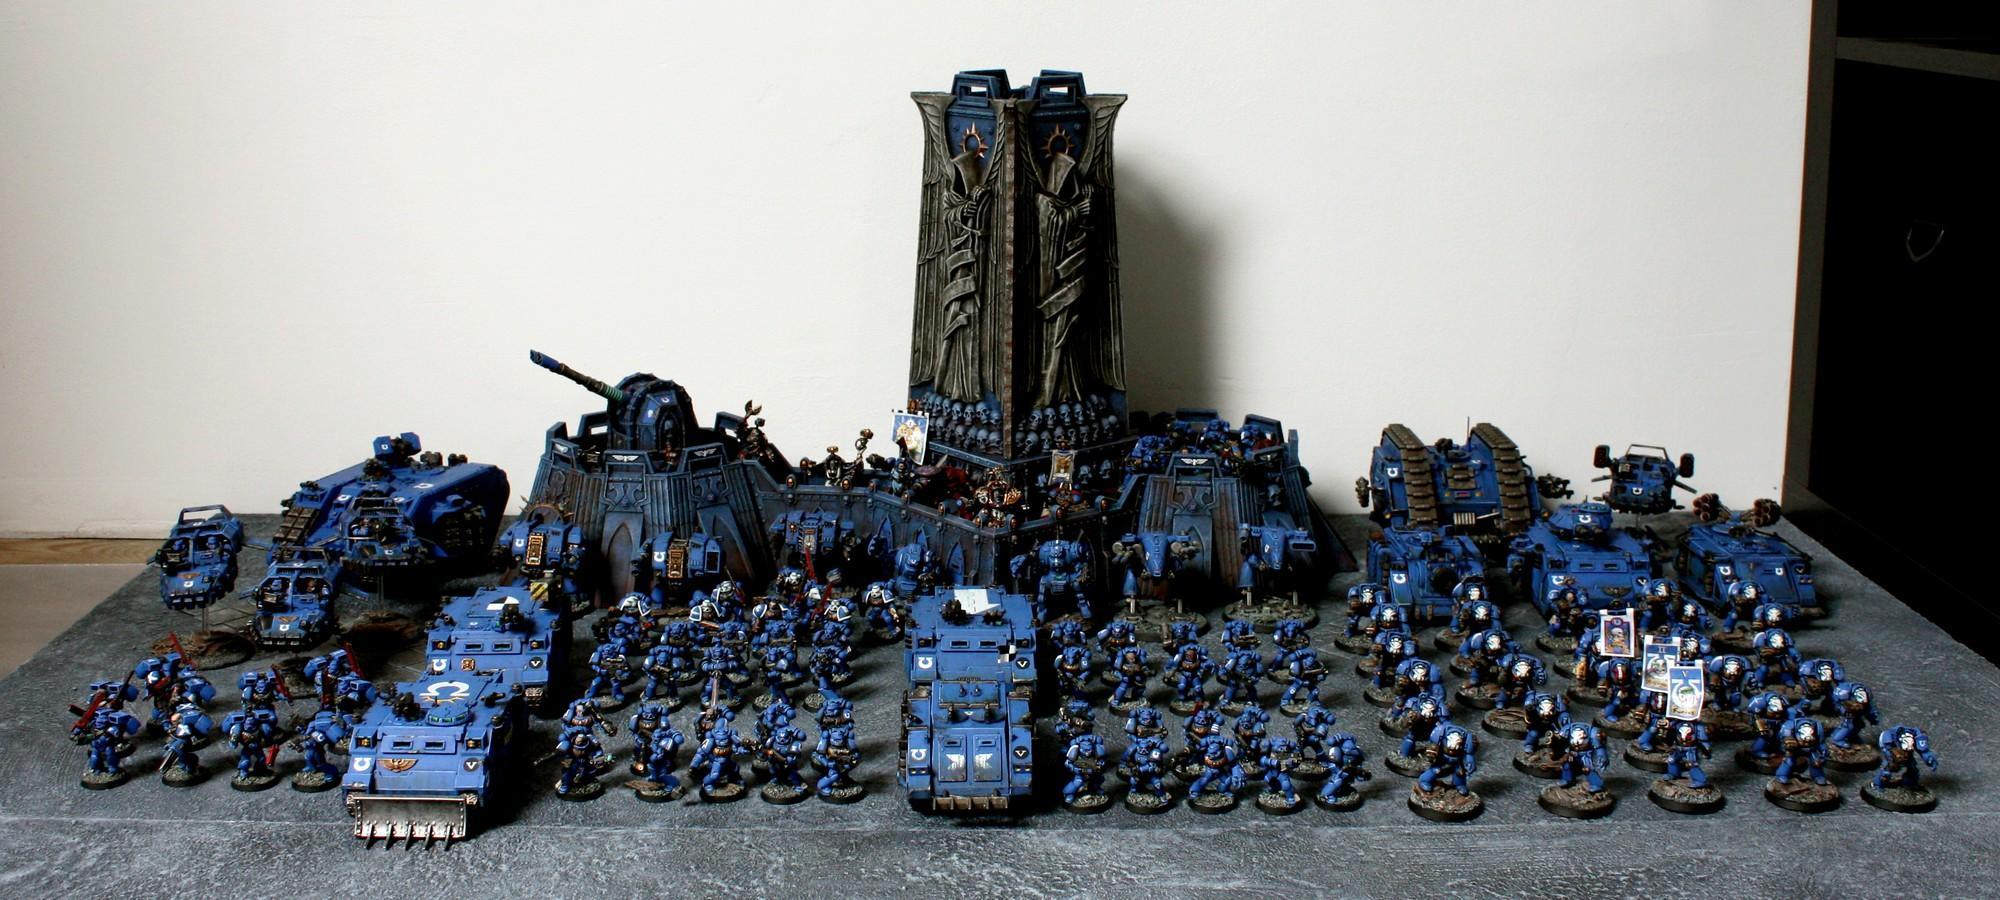 Army, Company, Fortress, Ultramarines